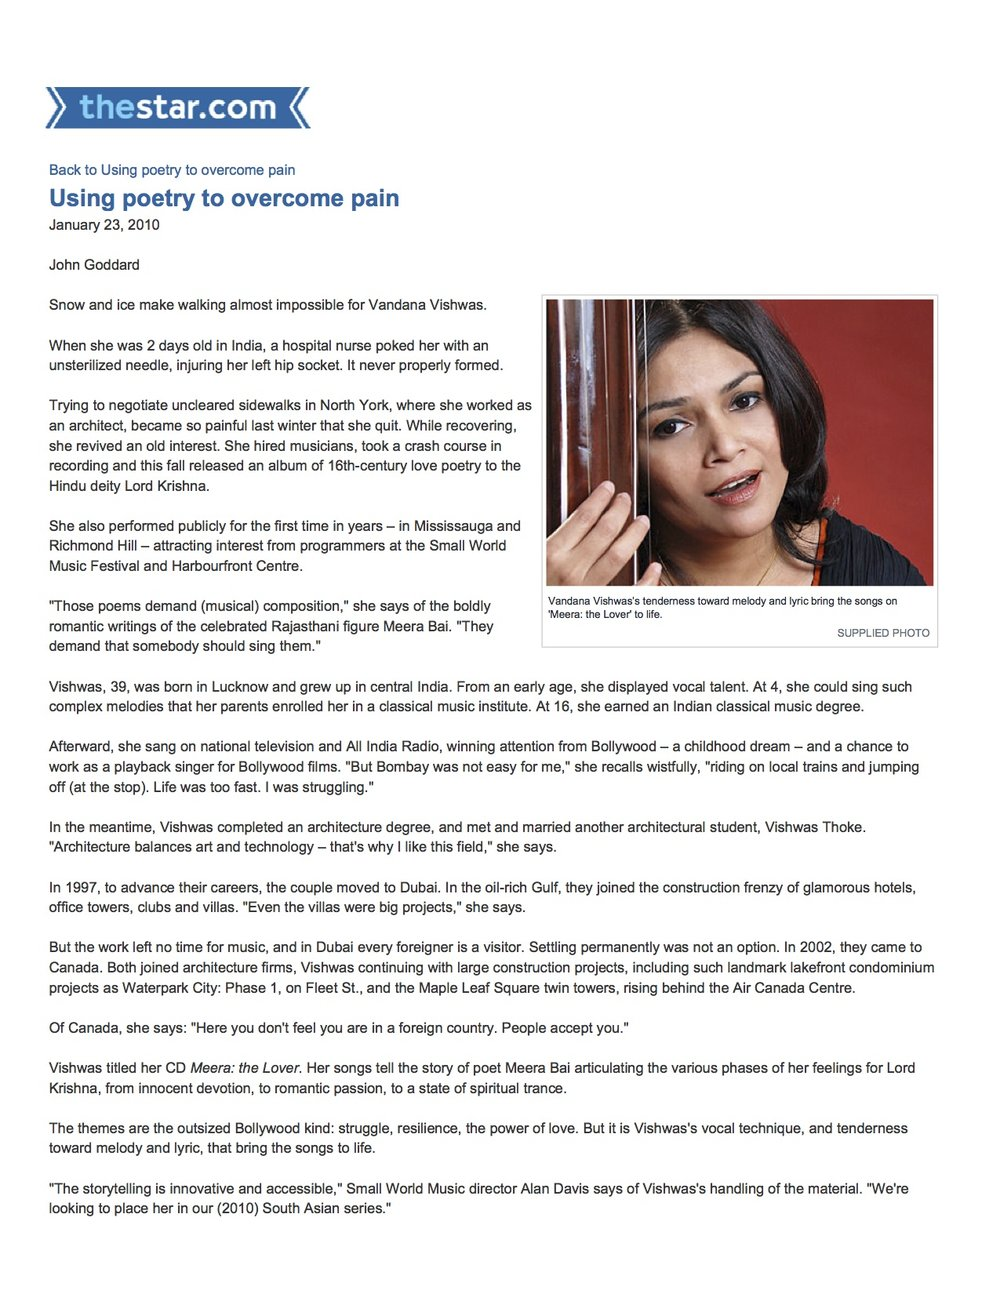 Vandana Vishwas - The Toronto Star 23 Jan 2010 copy.jpg